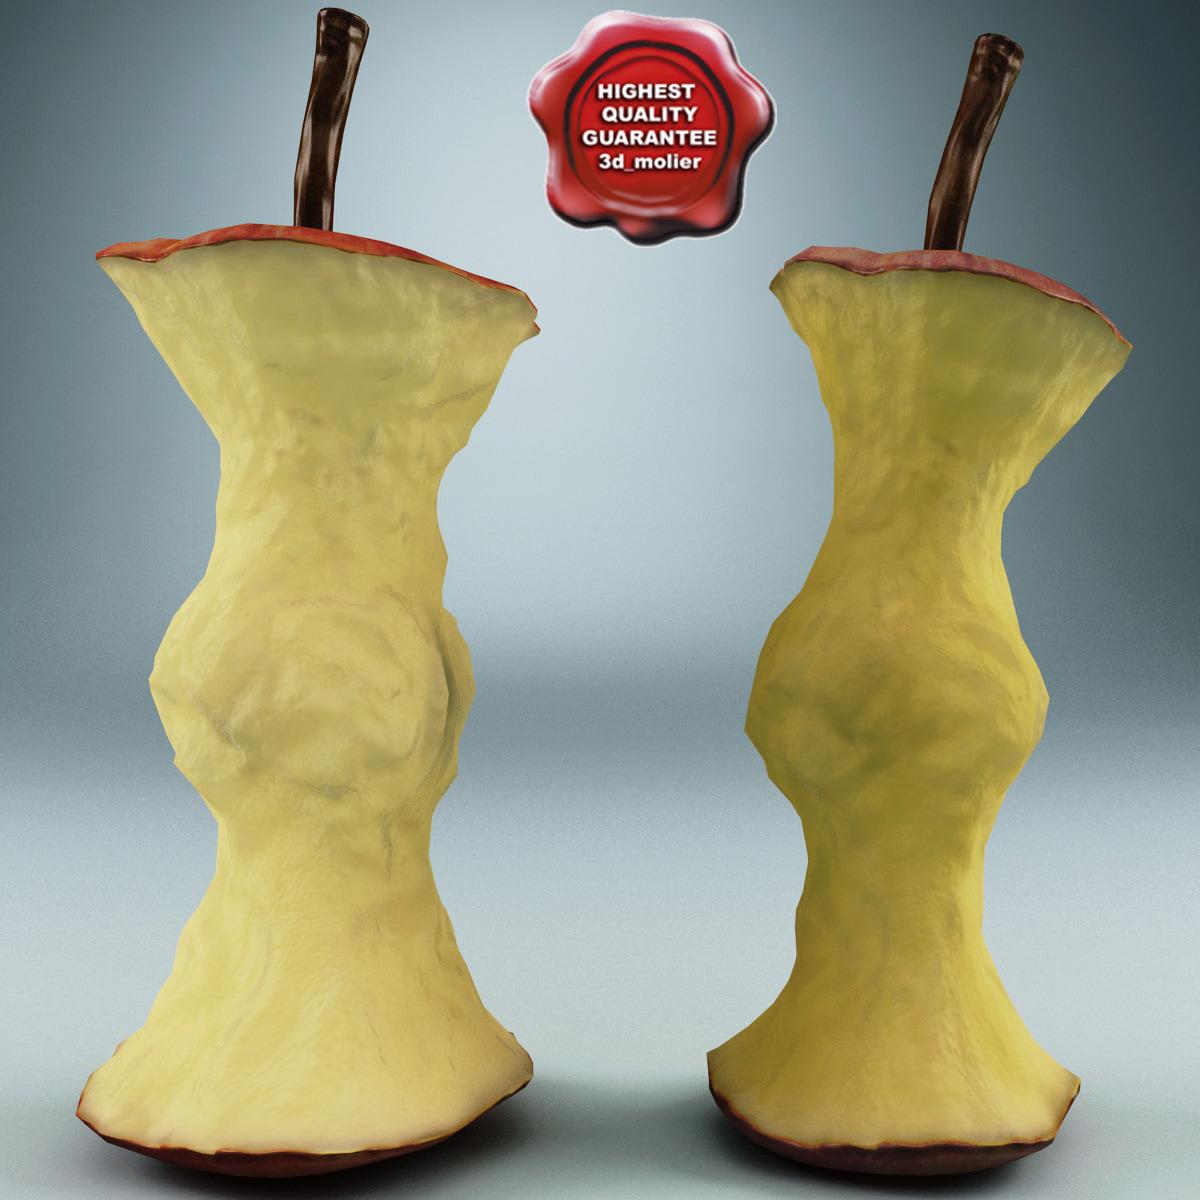 stub apples 3d model